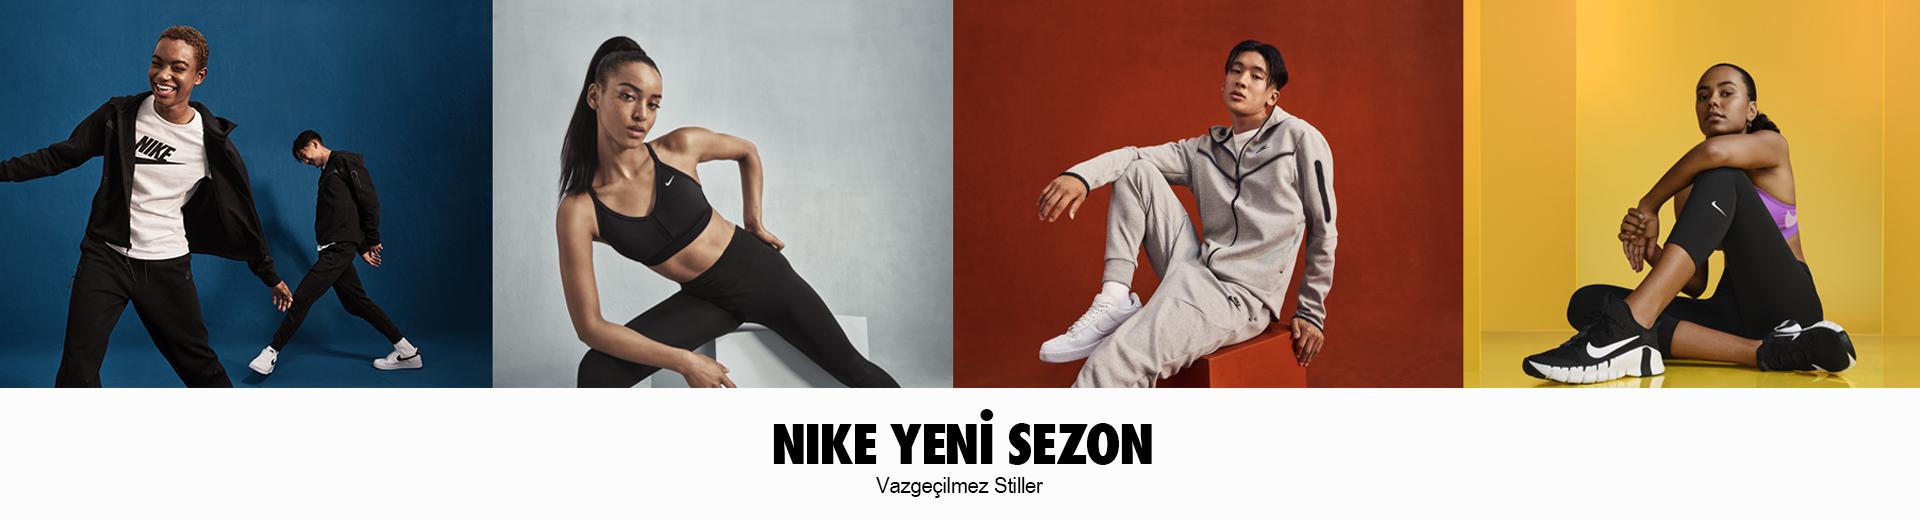 Yeni Sezon Nike